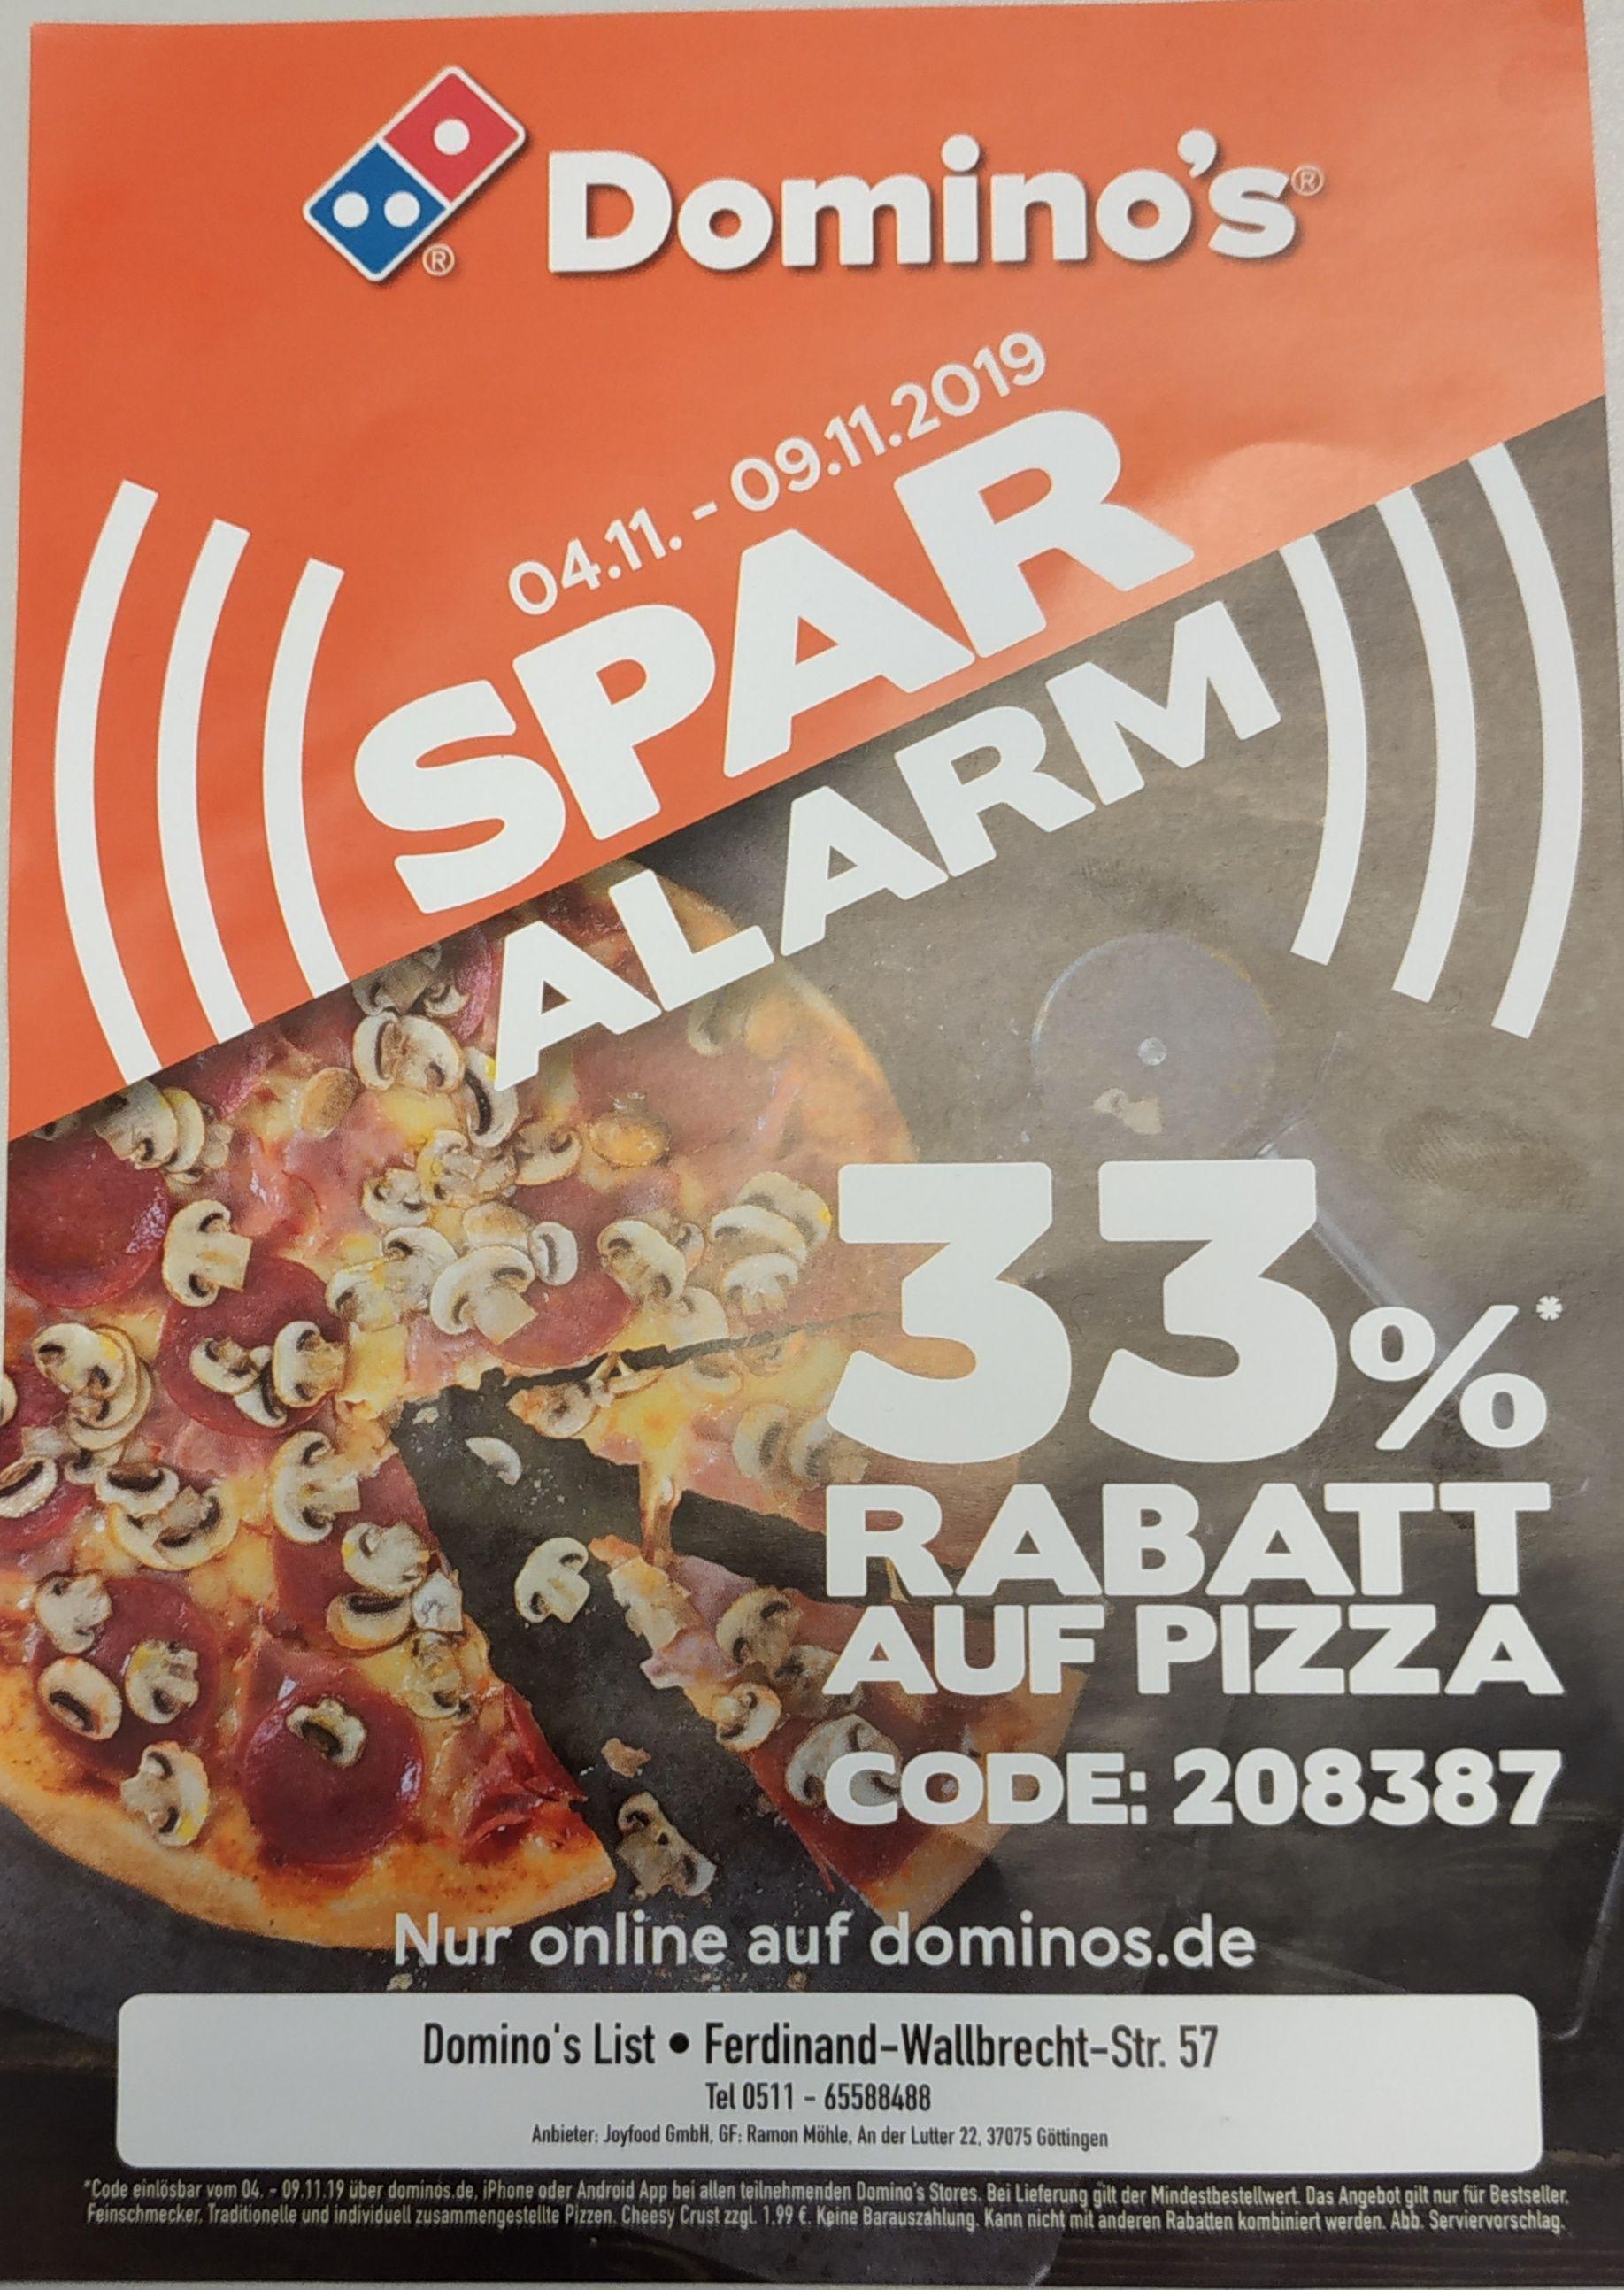 [ Dominos.de ] 33% Rabatt auf Pizza vom 04.11 bis 09.11